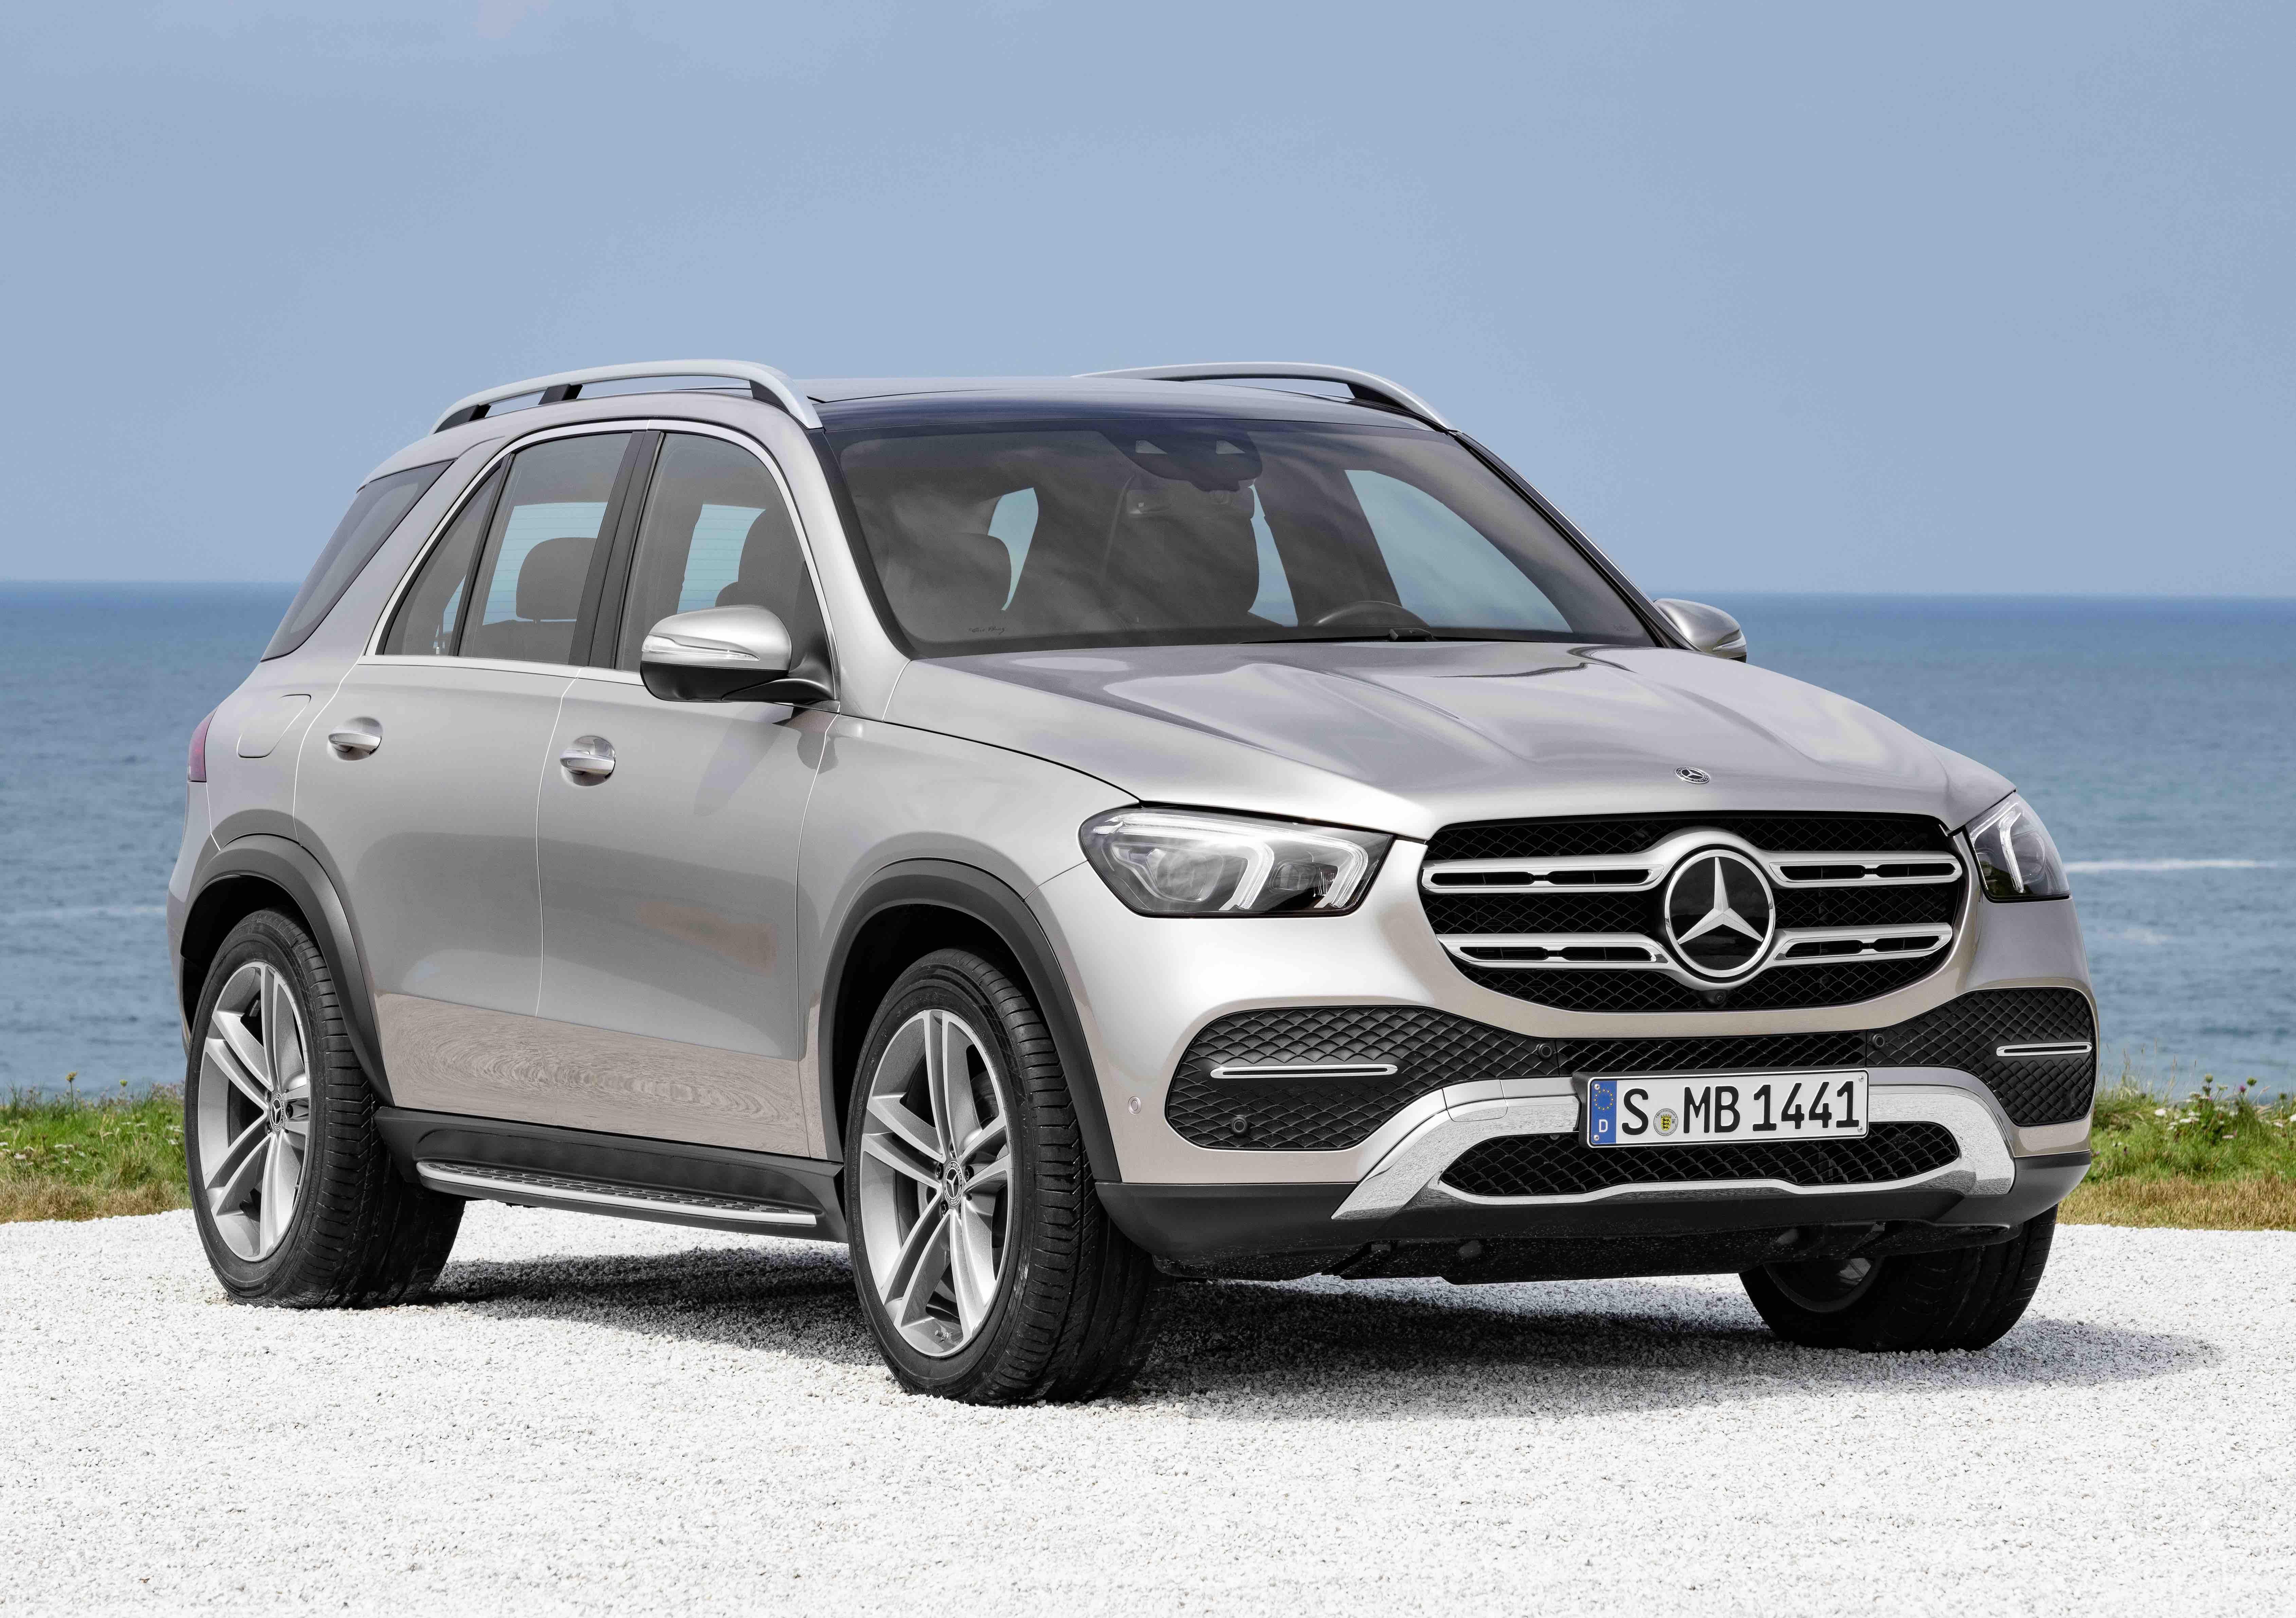 Impressive new Mercedes-Benz GLE arrives